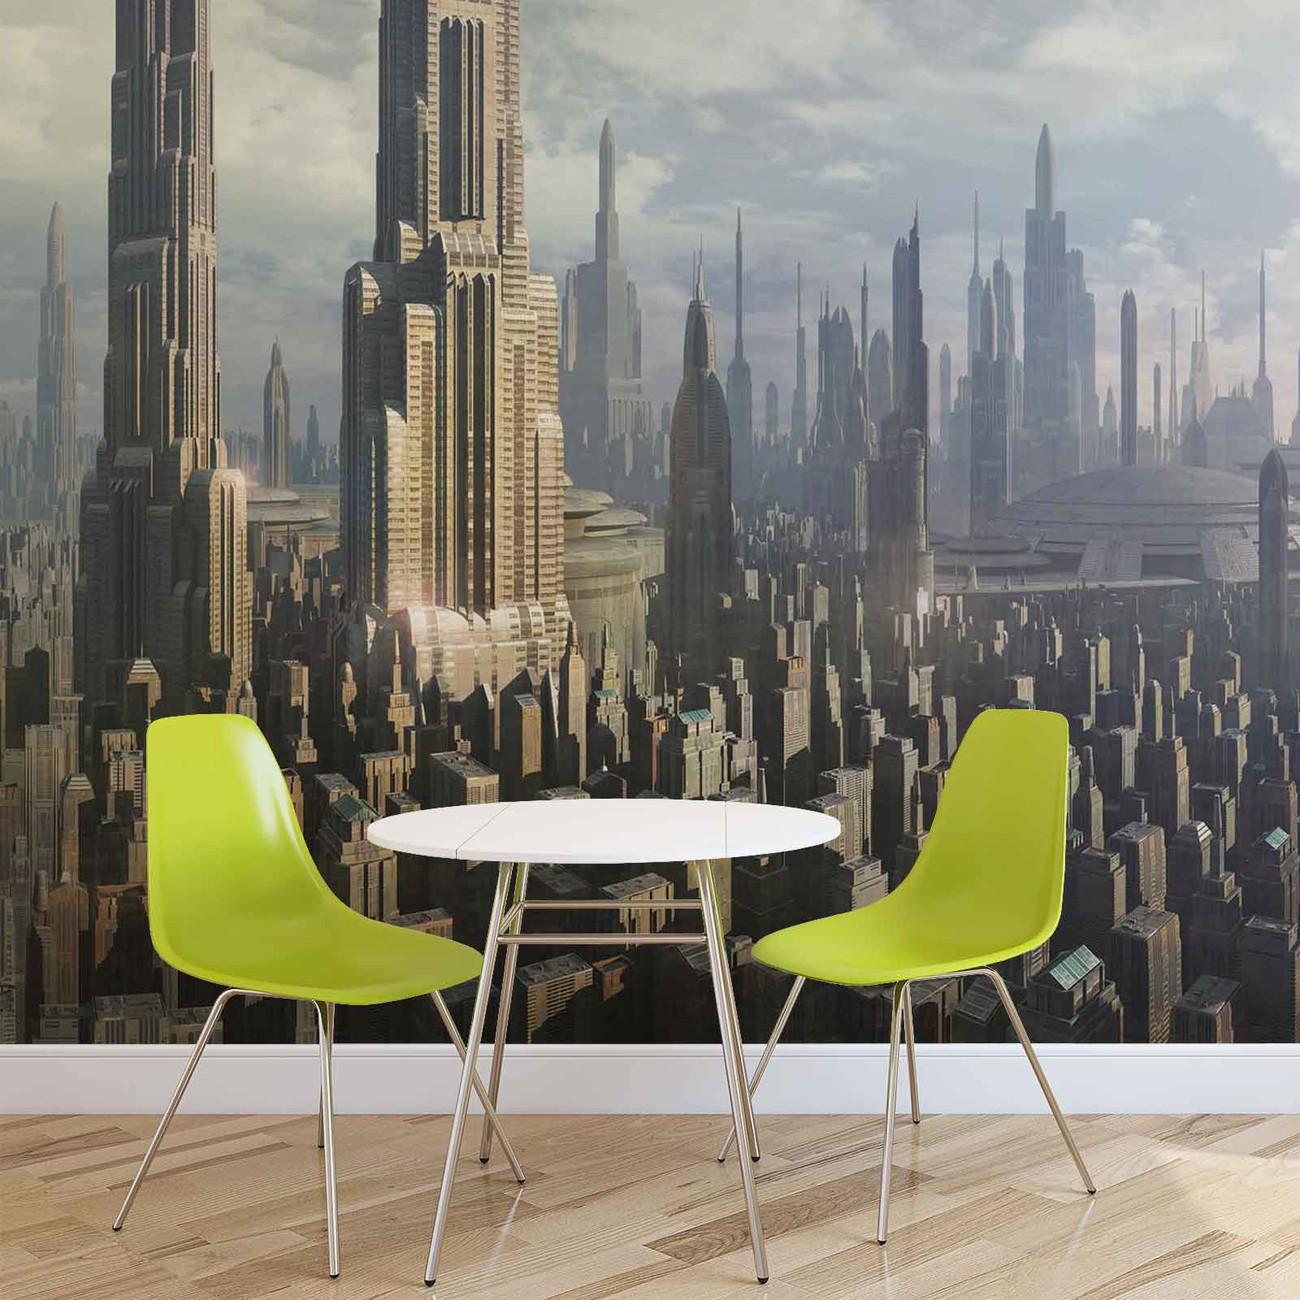 Star Wars City Coruscant Wall Paper Mural Buy At Ukposters